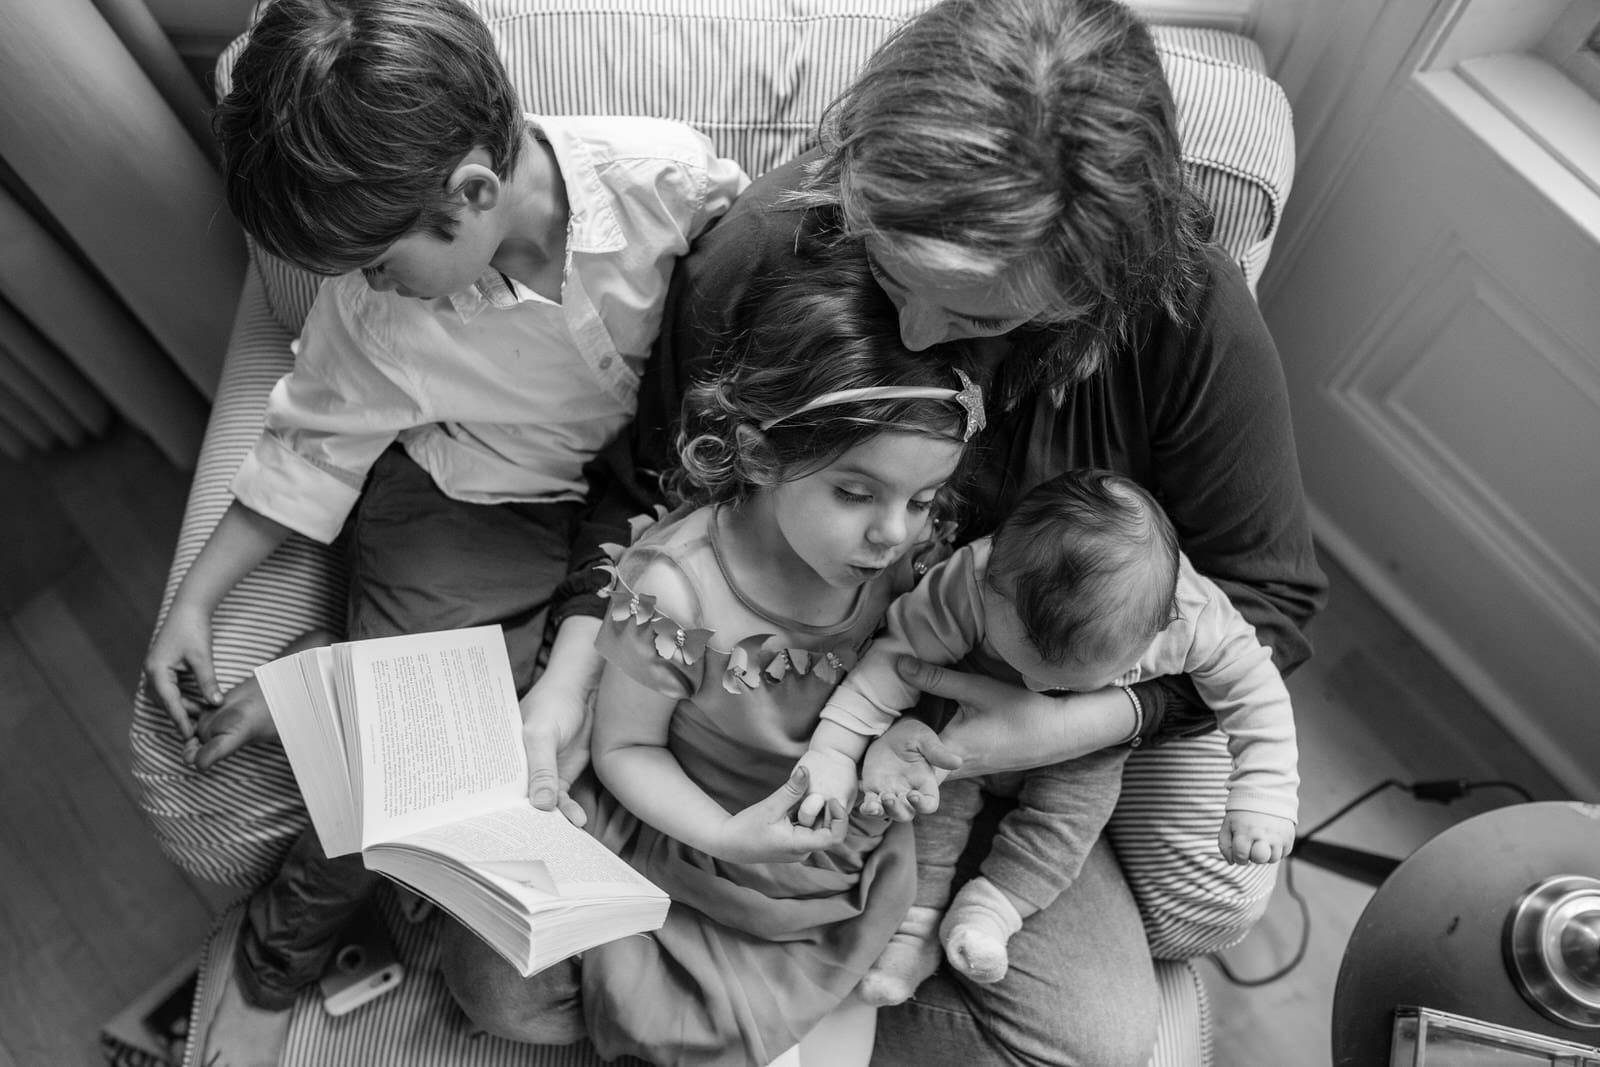 kensington-day-in-the-life-documentary-family-photographs-0089